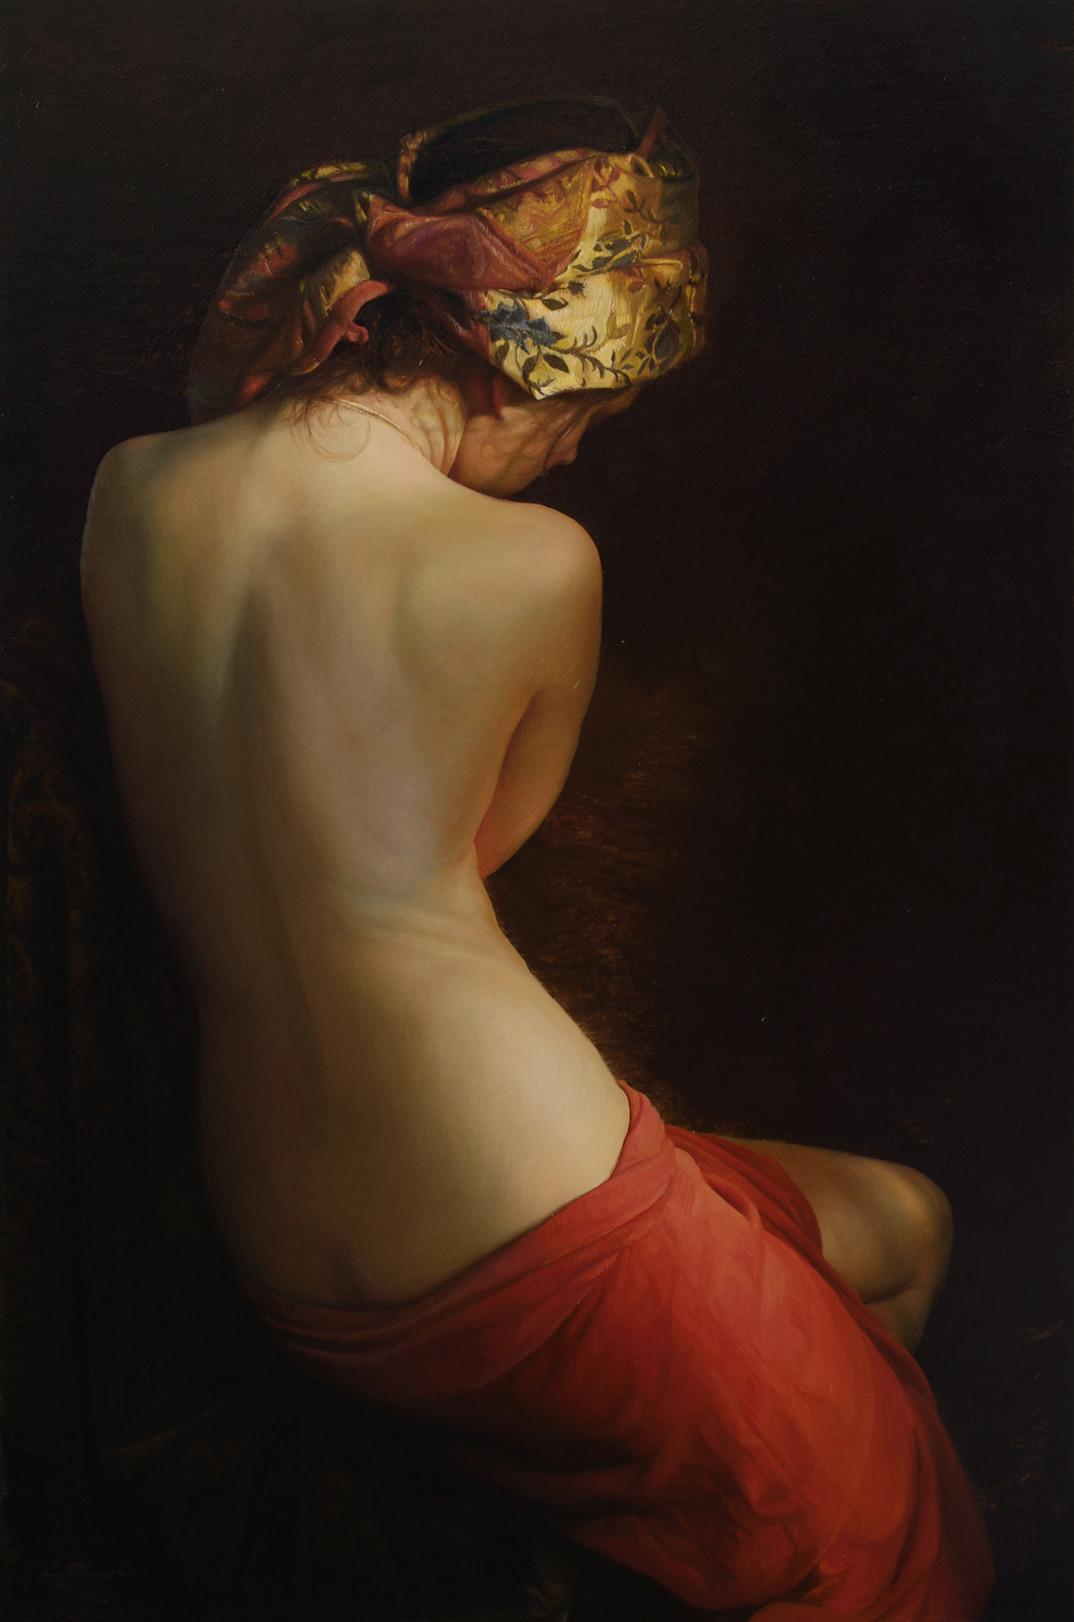 dipinti-olio-donne-seducenti-sensuali-sergei-marshennikov-10